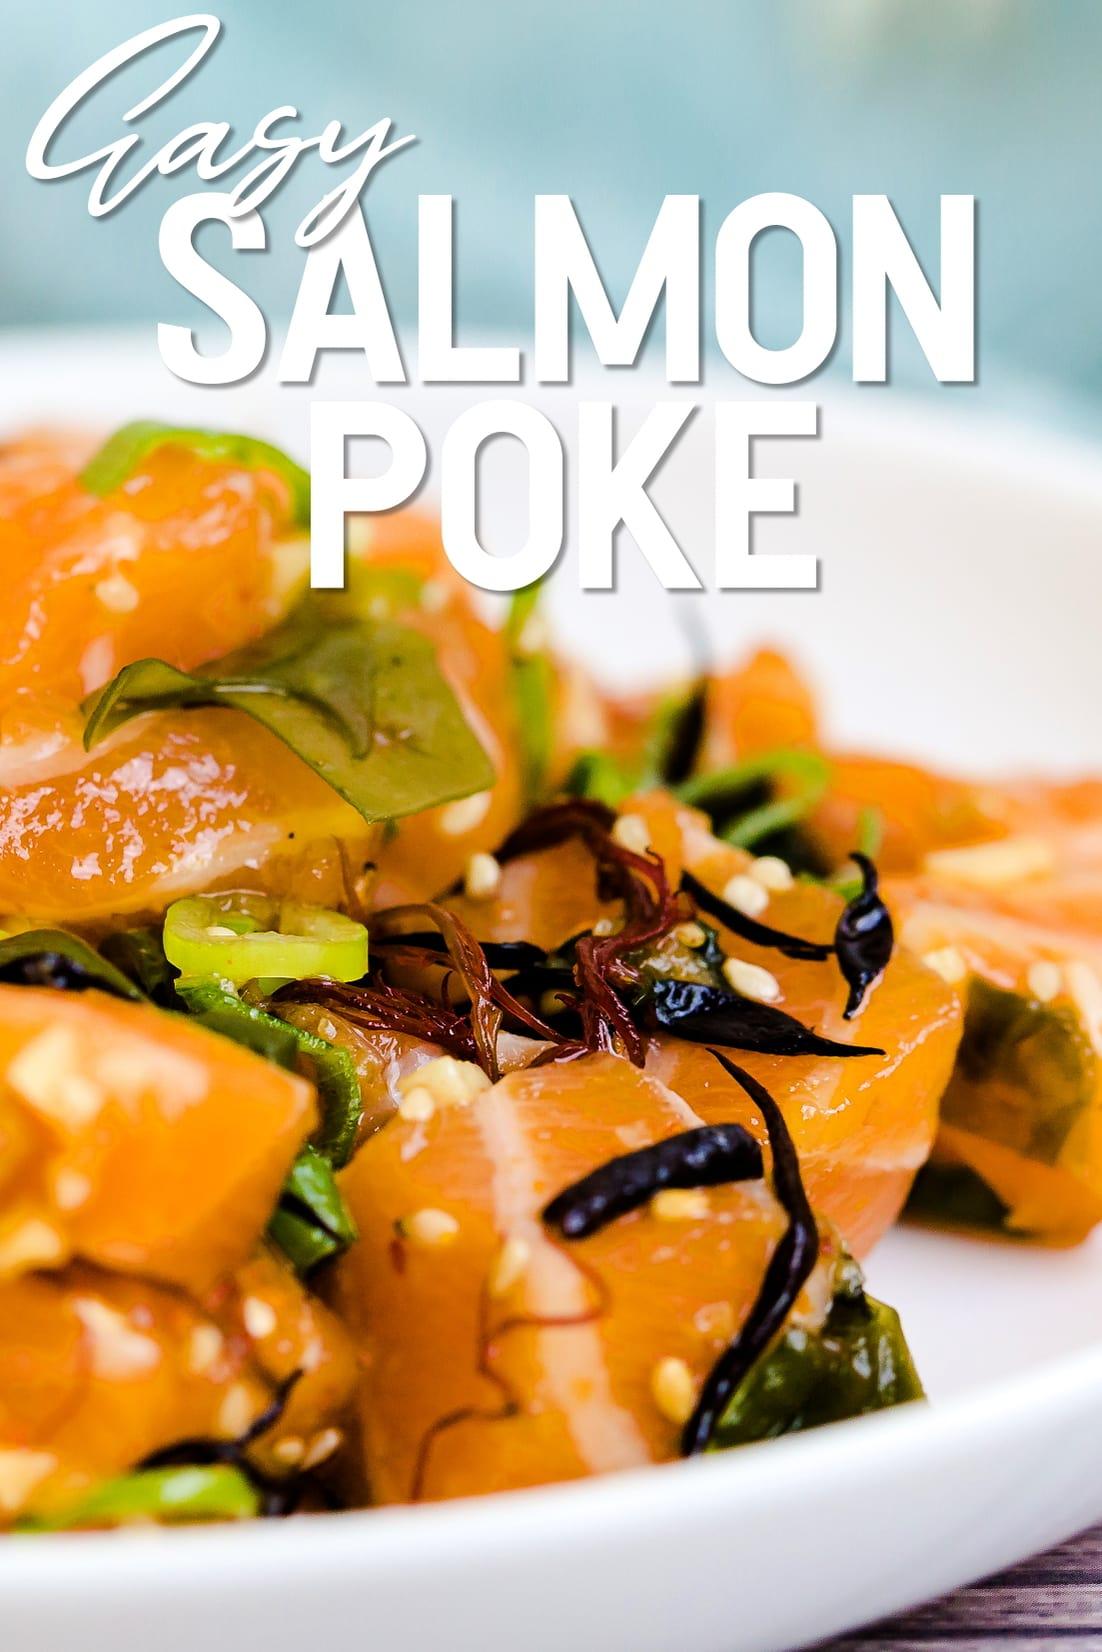 Salmon Poke served on a white plate